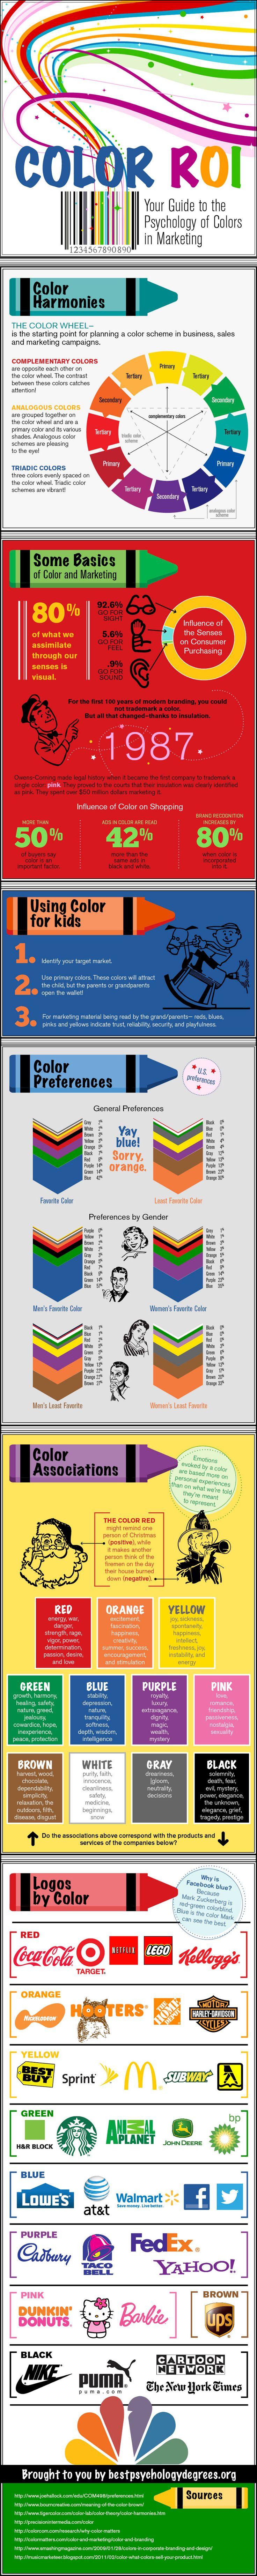 More on understanding color psychology - really interesting stuff!